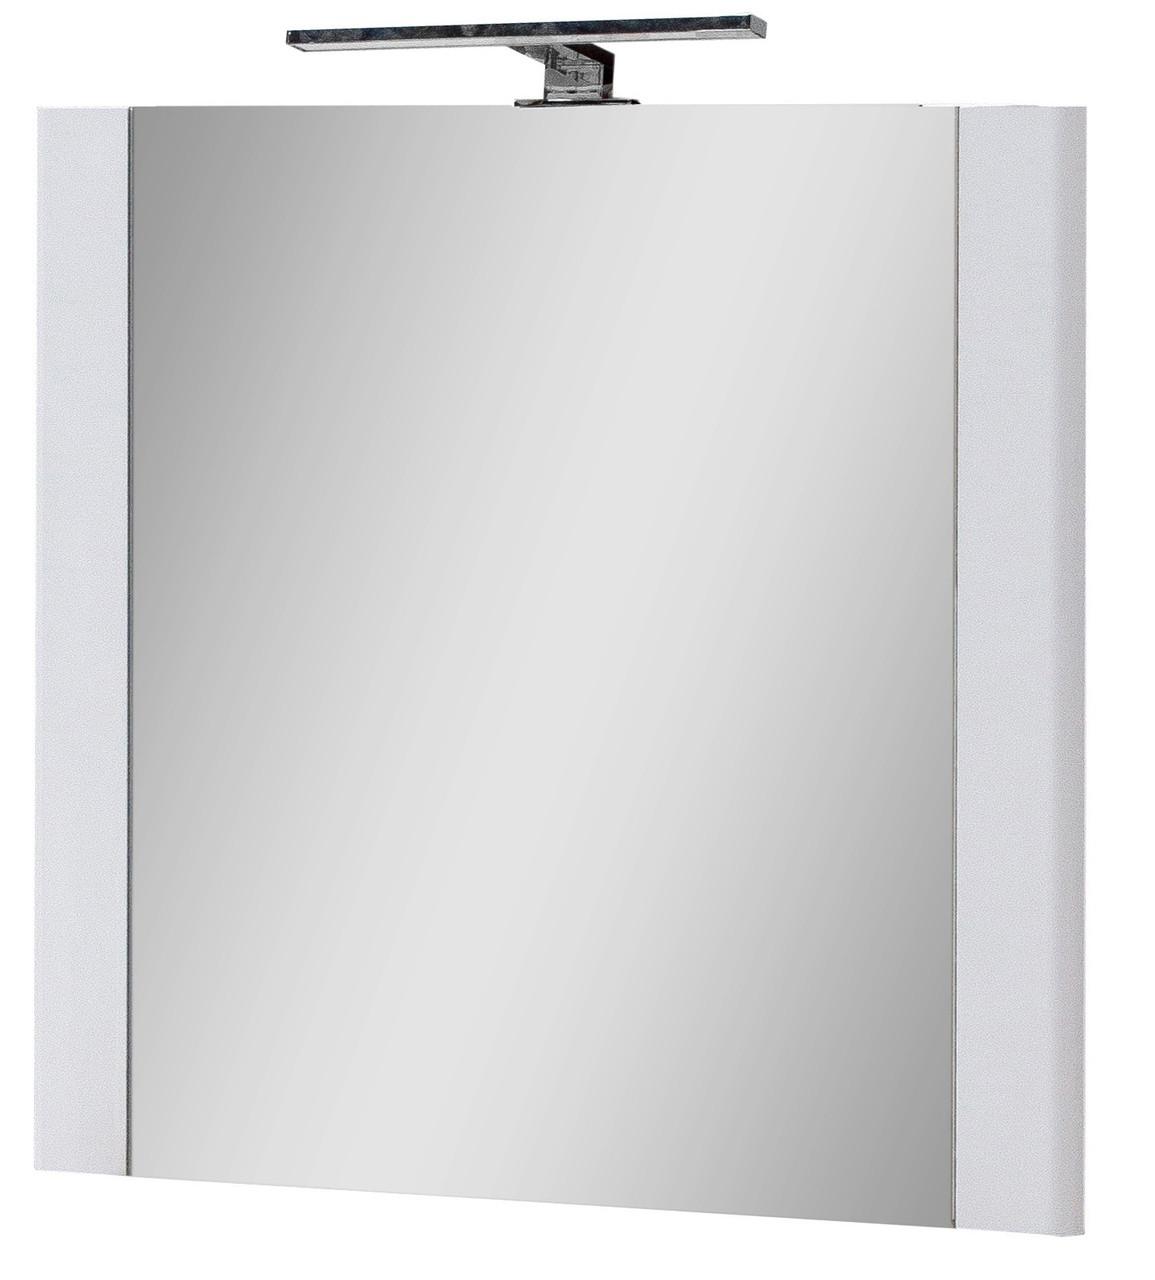 Зеркало для ванной комнаты Z-Эльба 70 (с подсветкой) Юввис